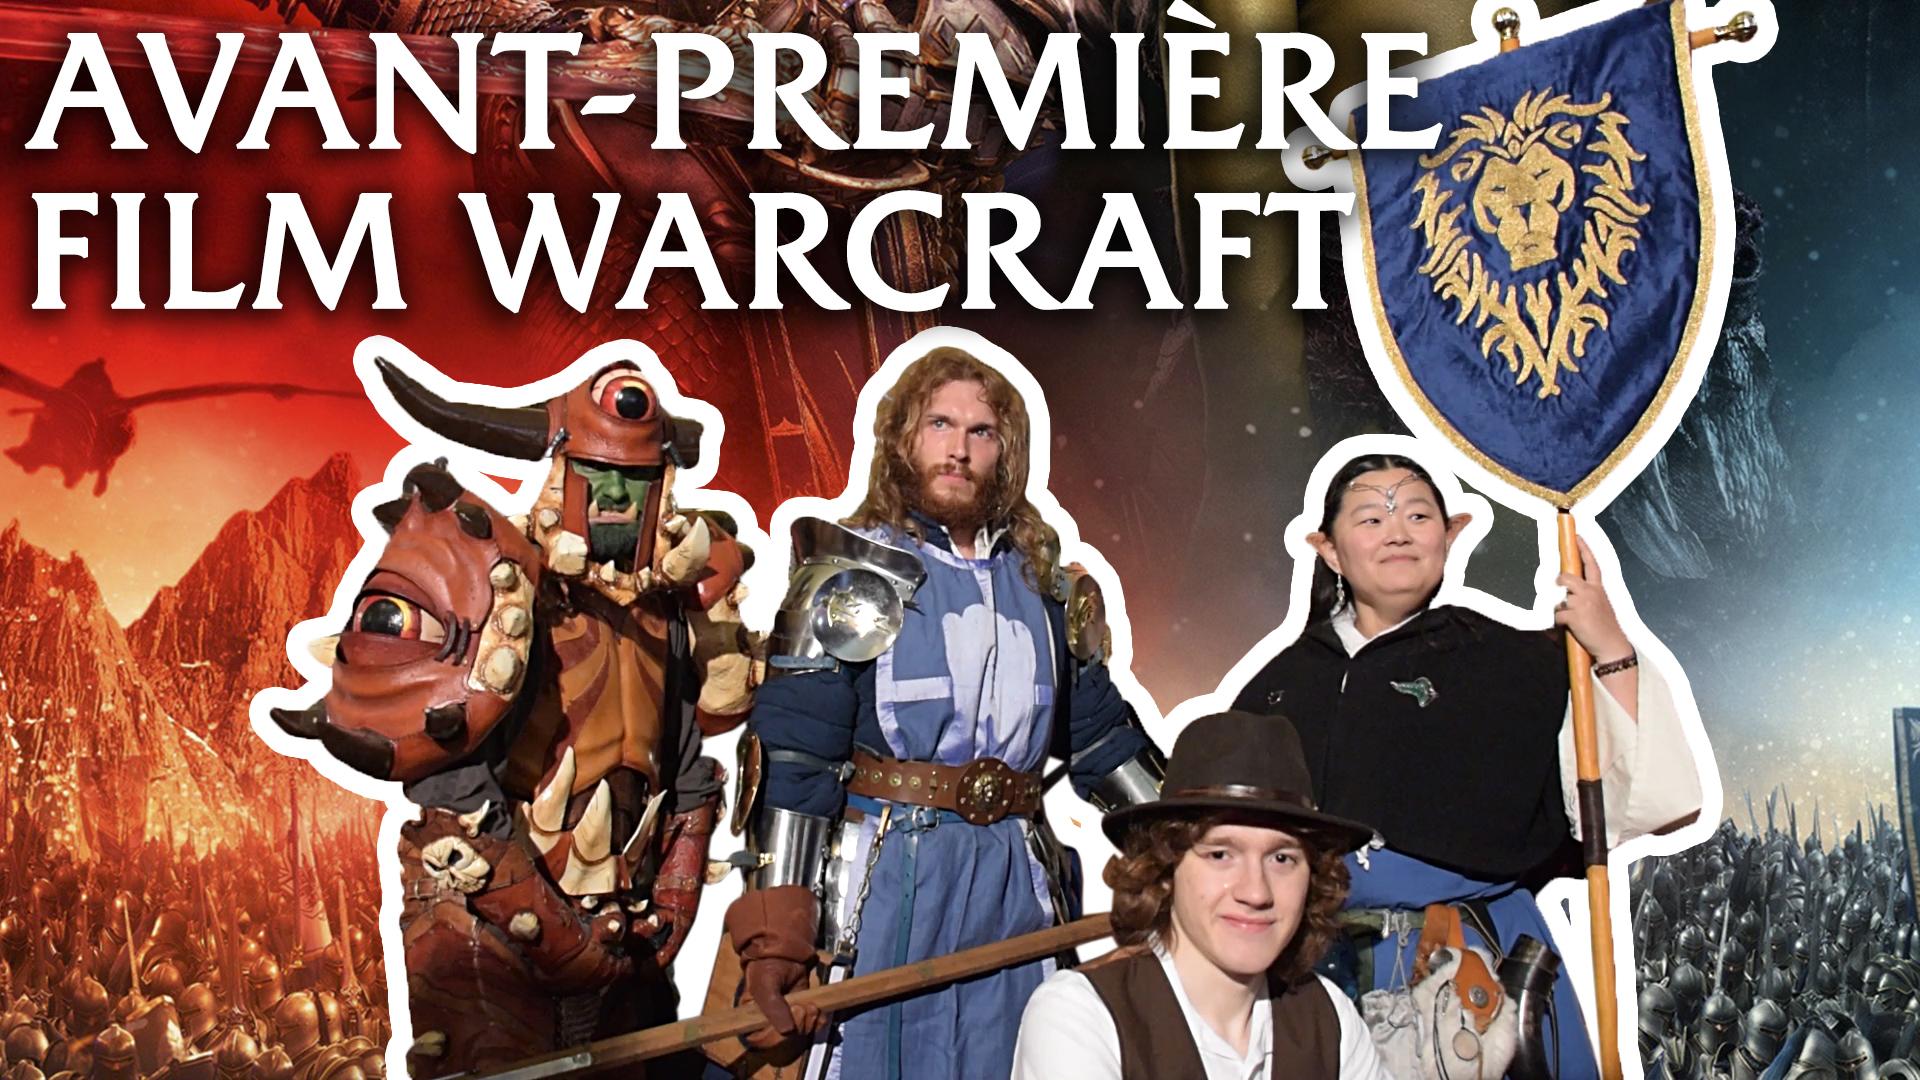 avant-premiere-film-warcraft